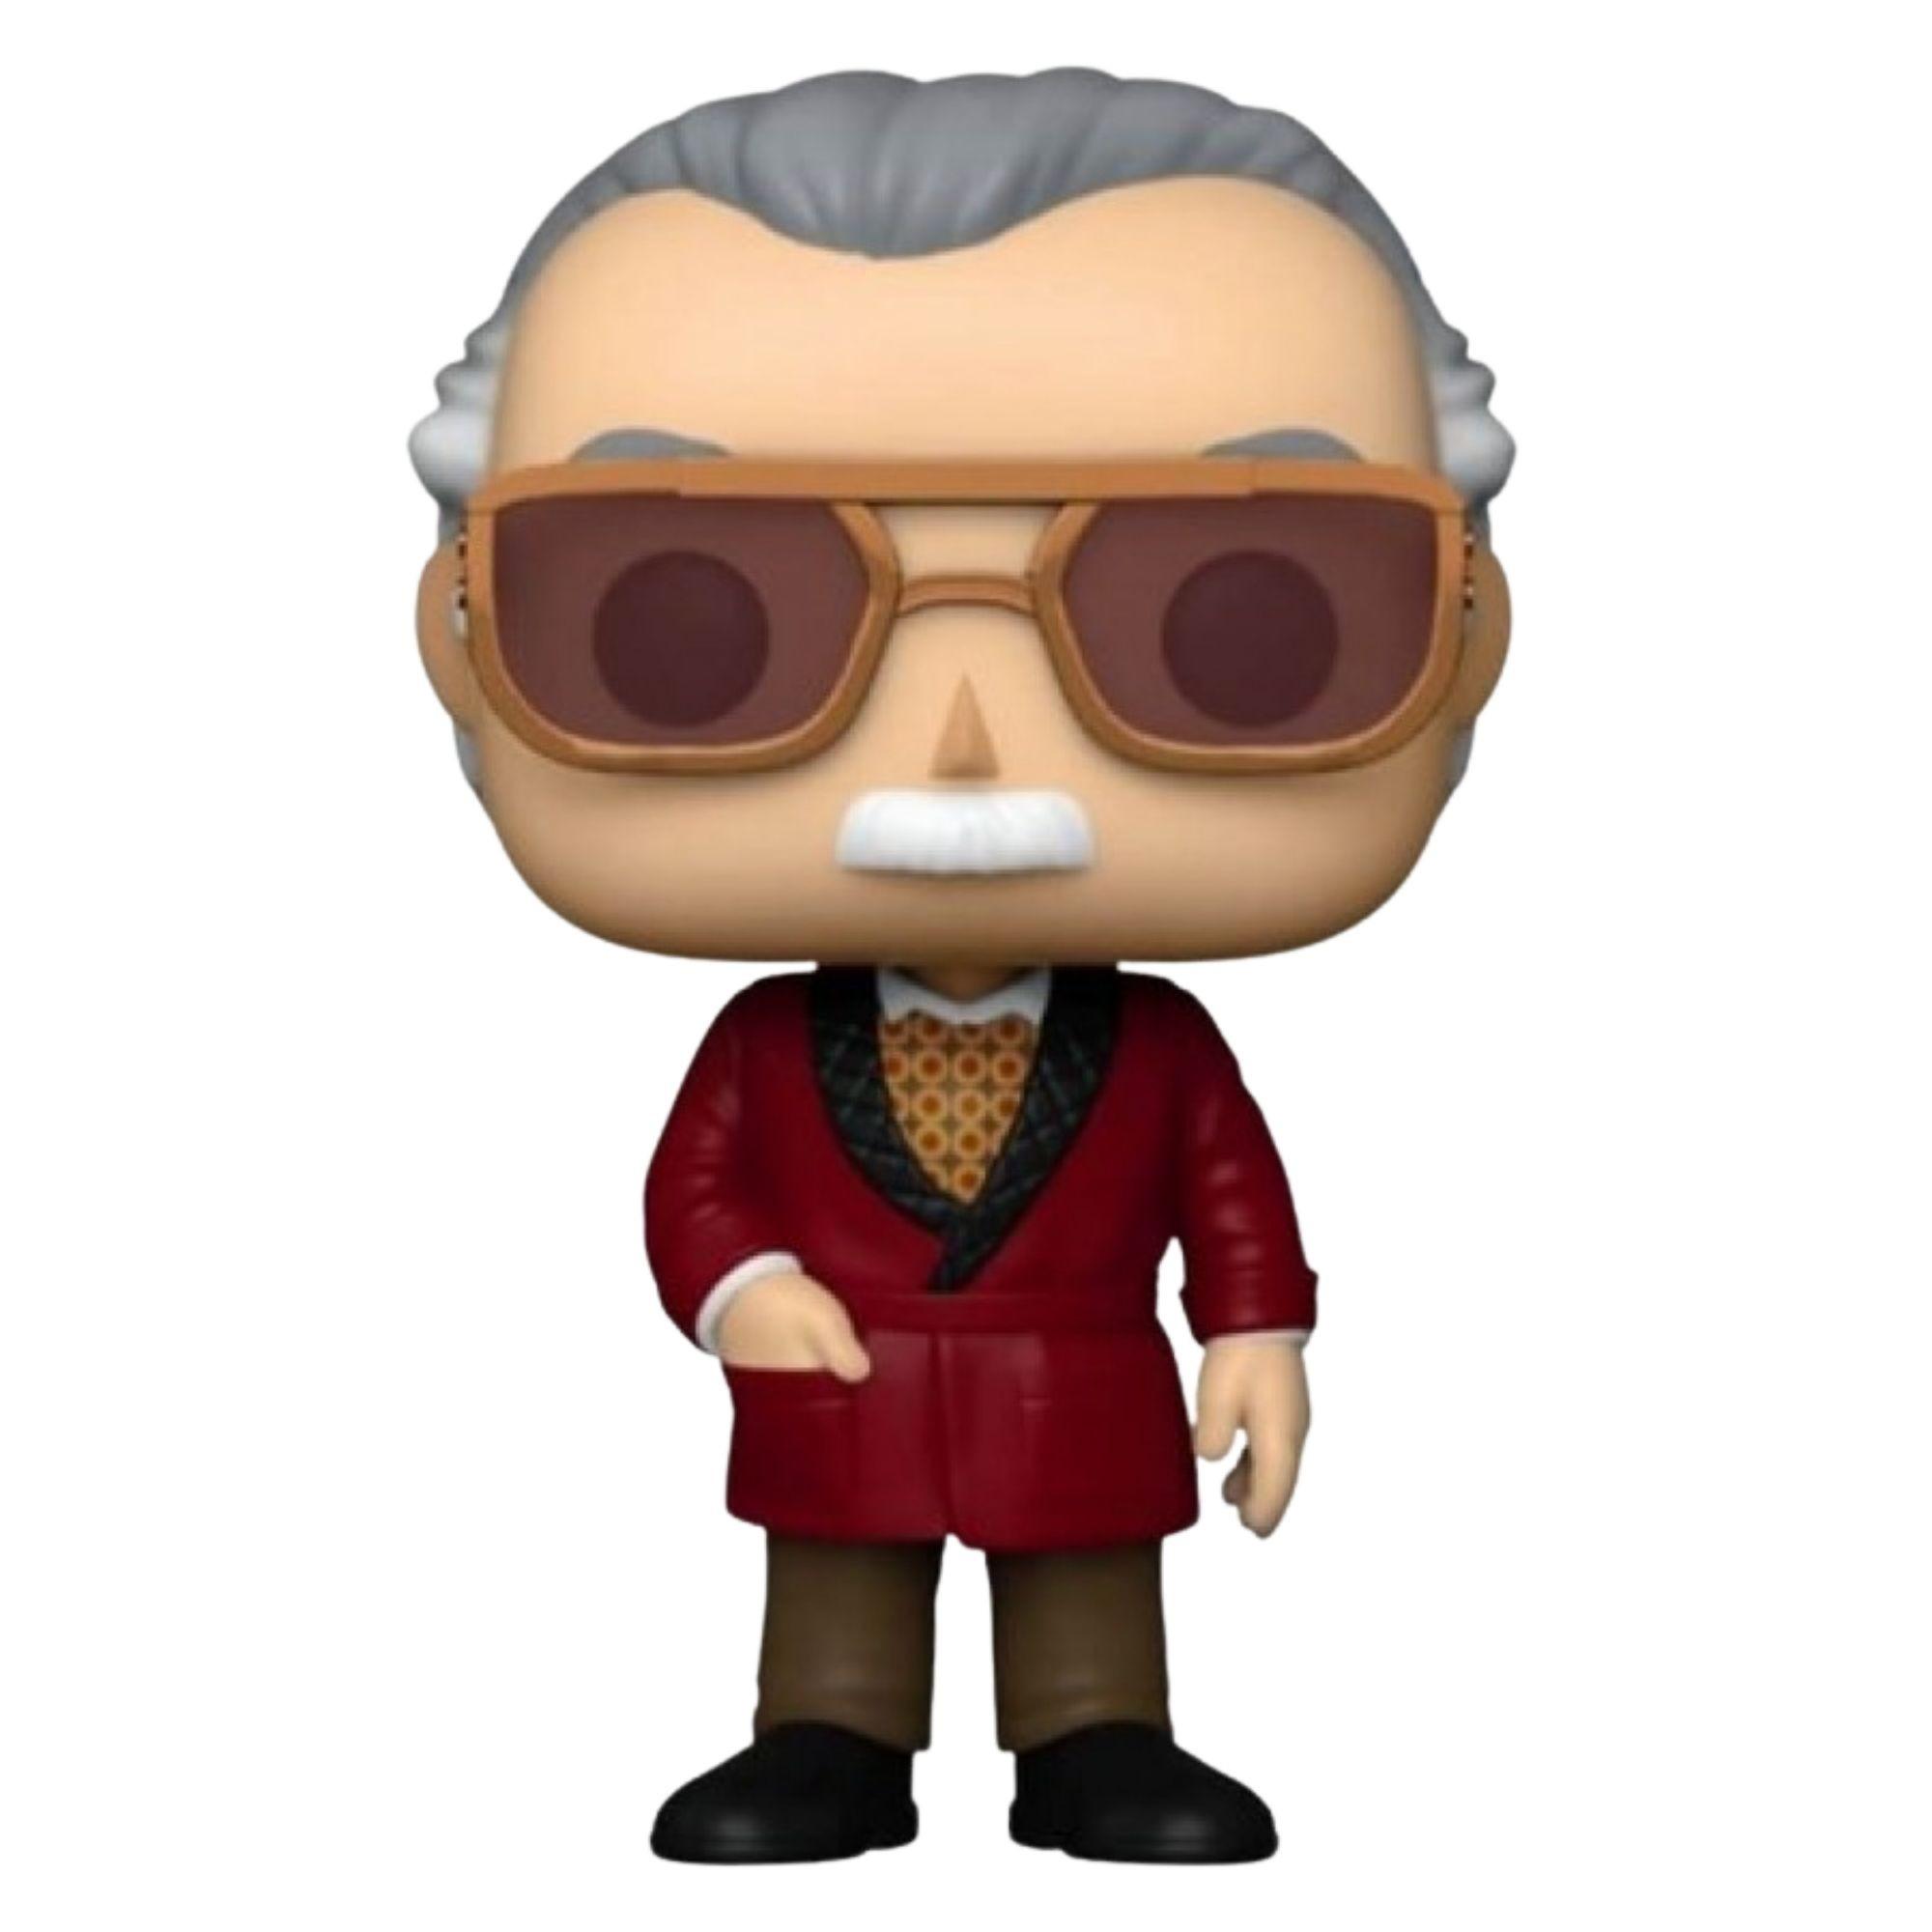 Funko Pop Marvel Iron Man Stan Lee #656 Exclusivo  - Game Land Brinquedos